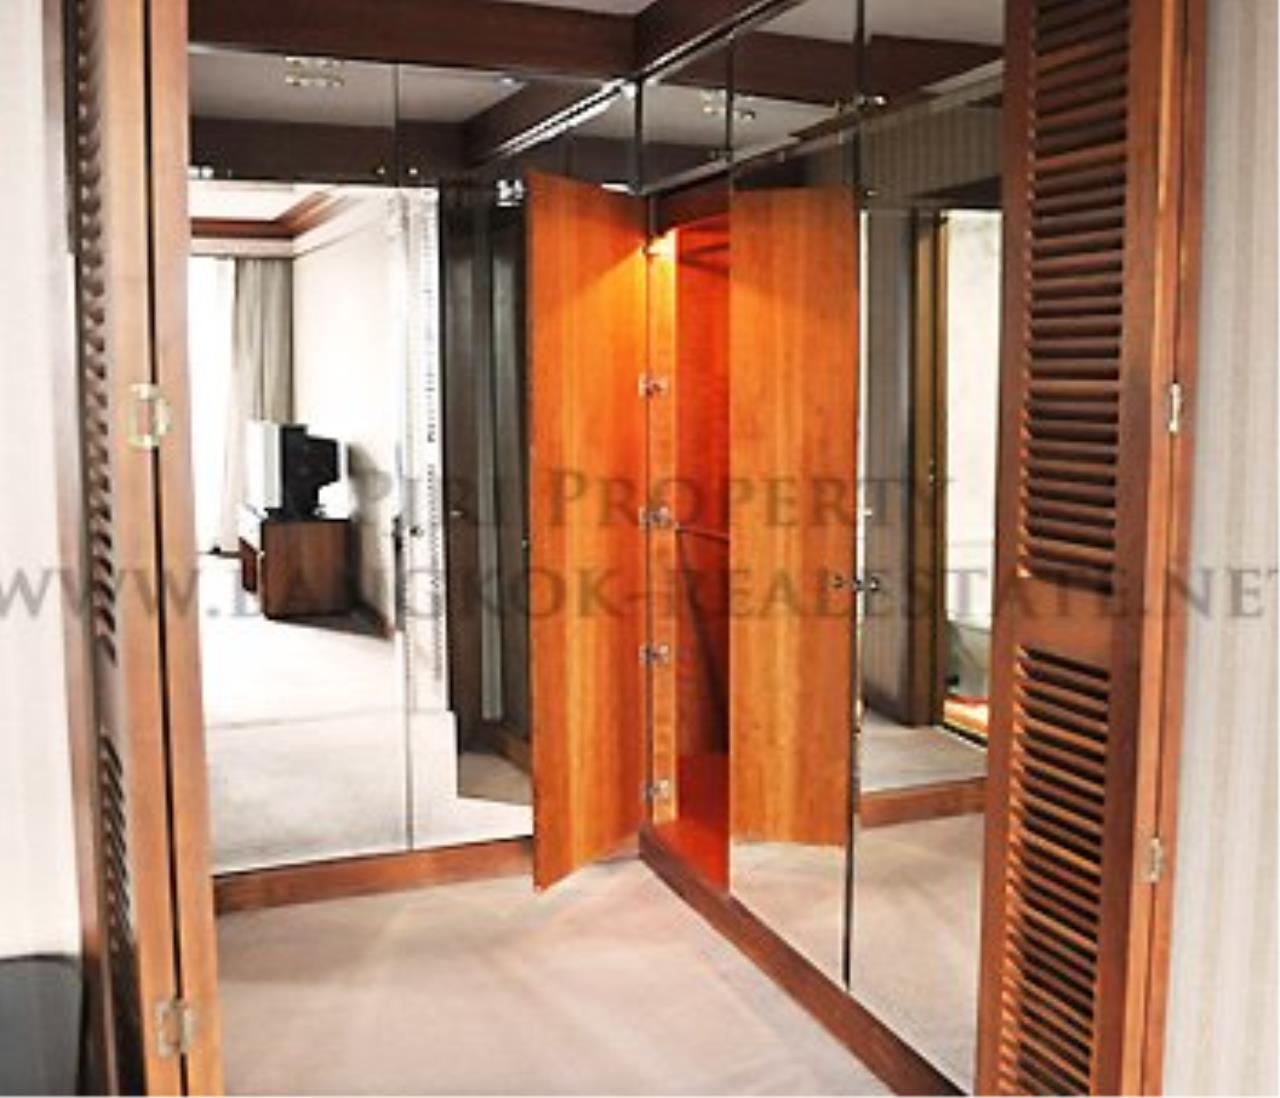 Piri Property Agency's Royal Place - Spacious 2 Bedroom - 137 SQM in Rachadamri - 55K 6